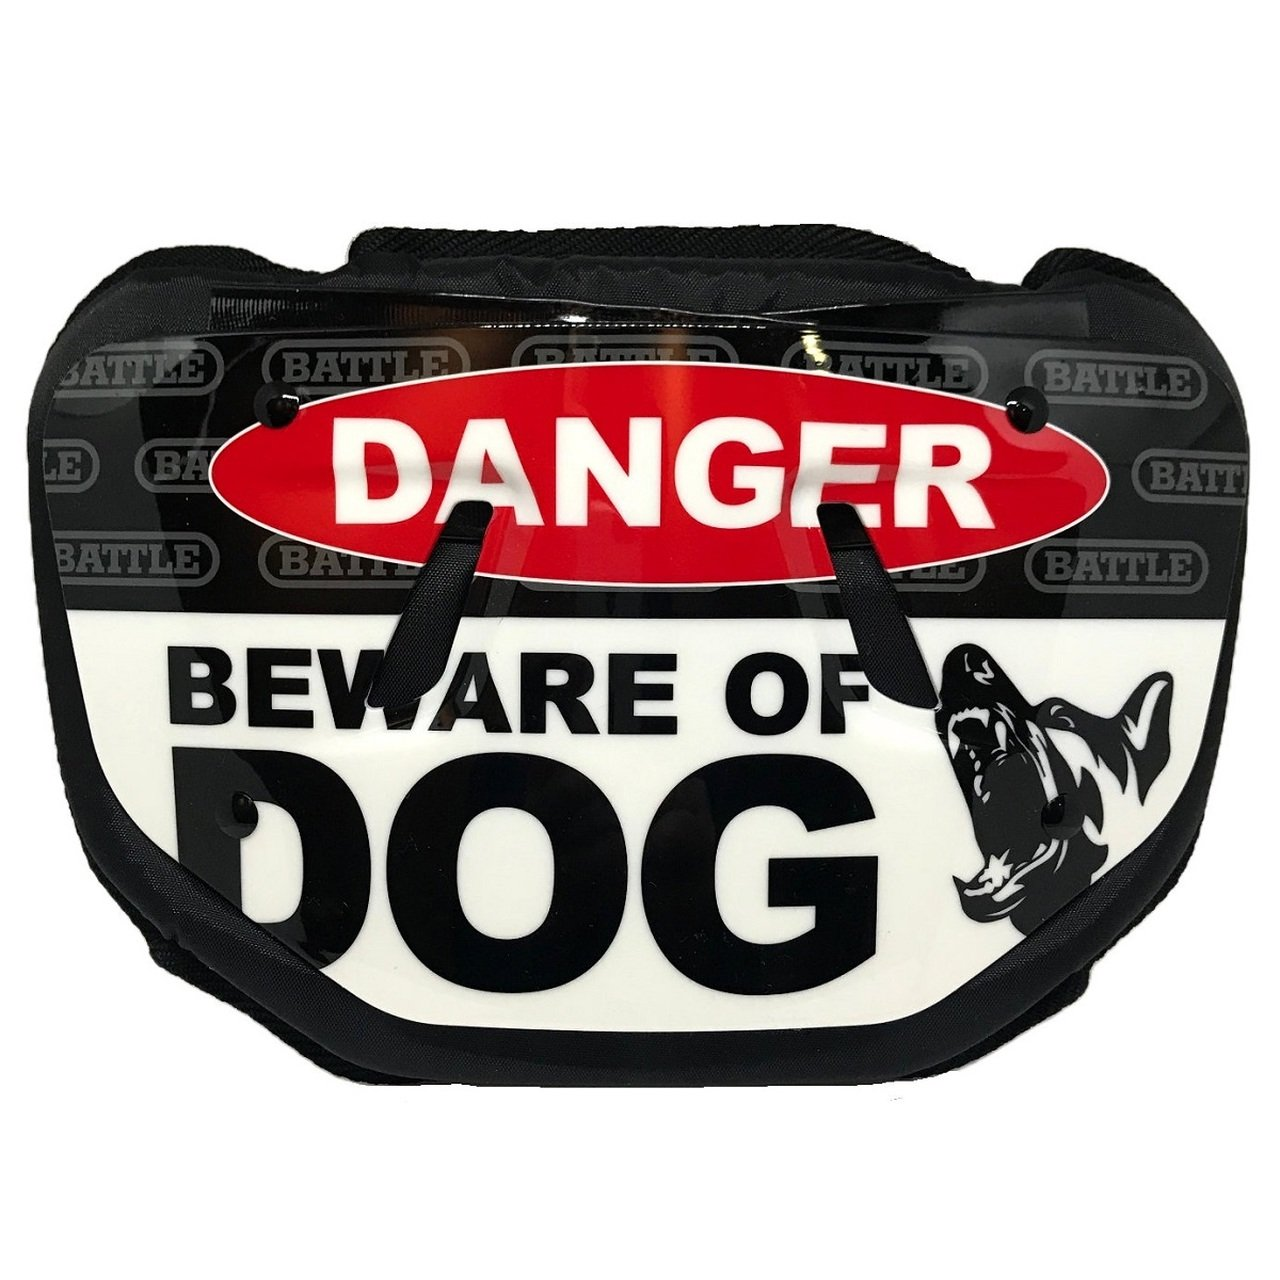 Battle Quot Beware Of Dog Quot Youth Chrome Football Back Plate Walmart Com Walmart Com